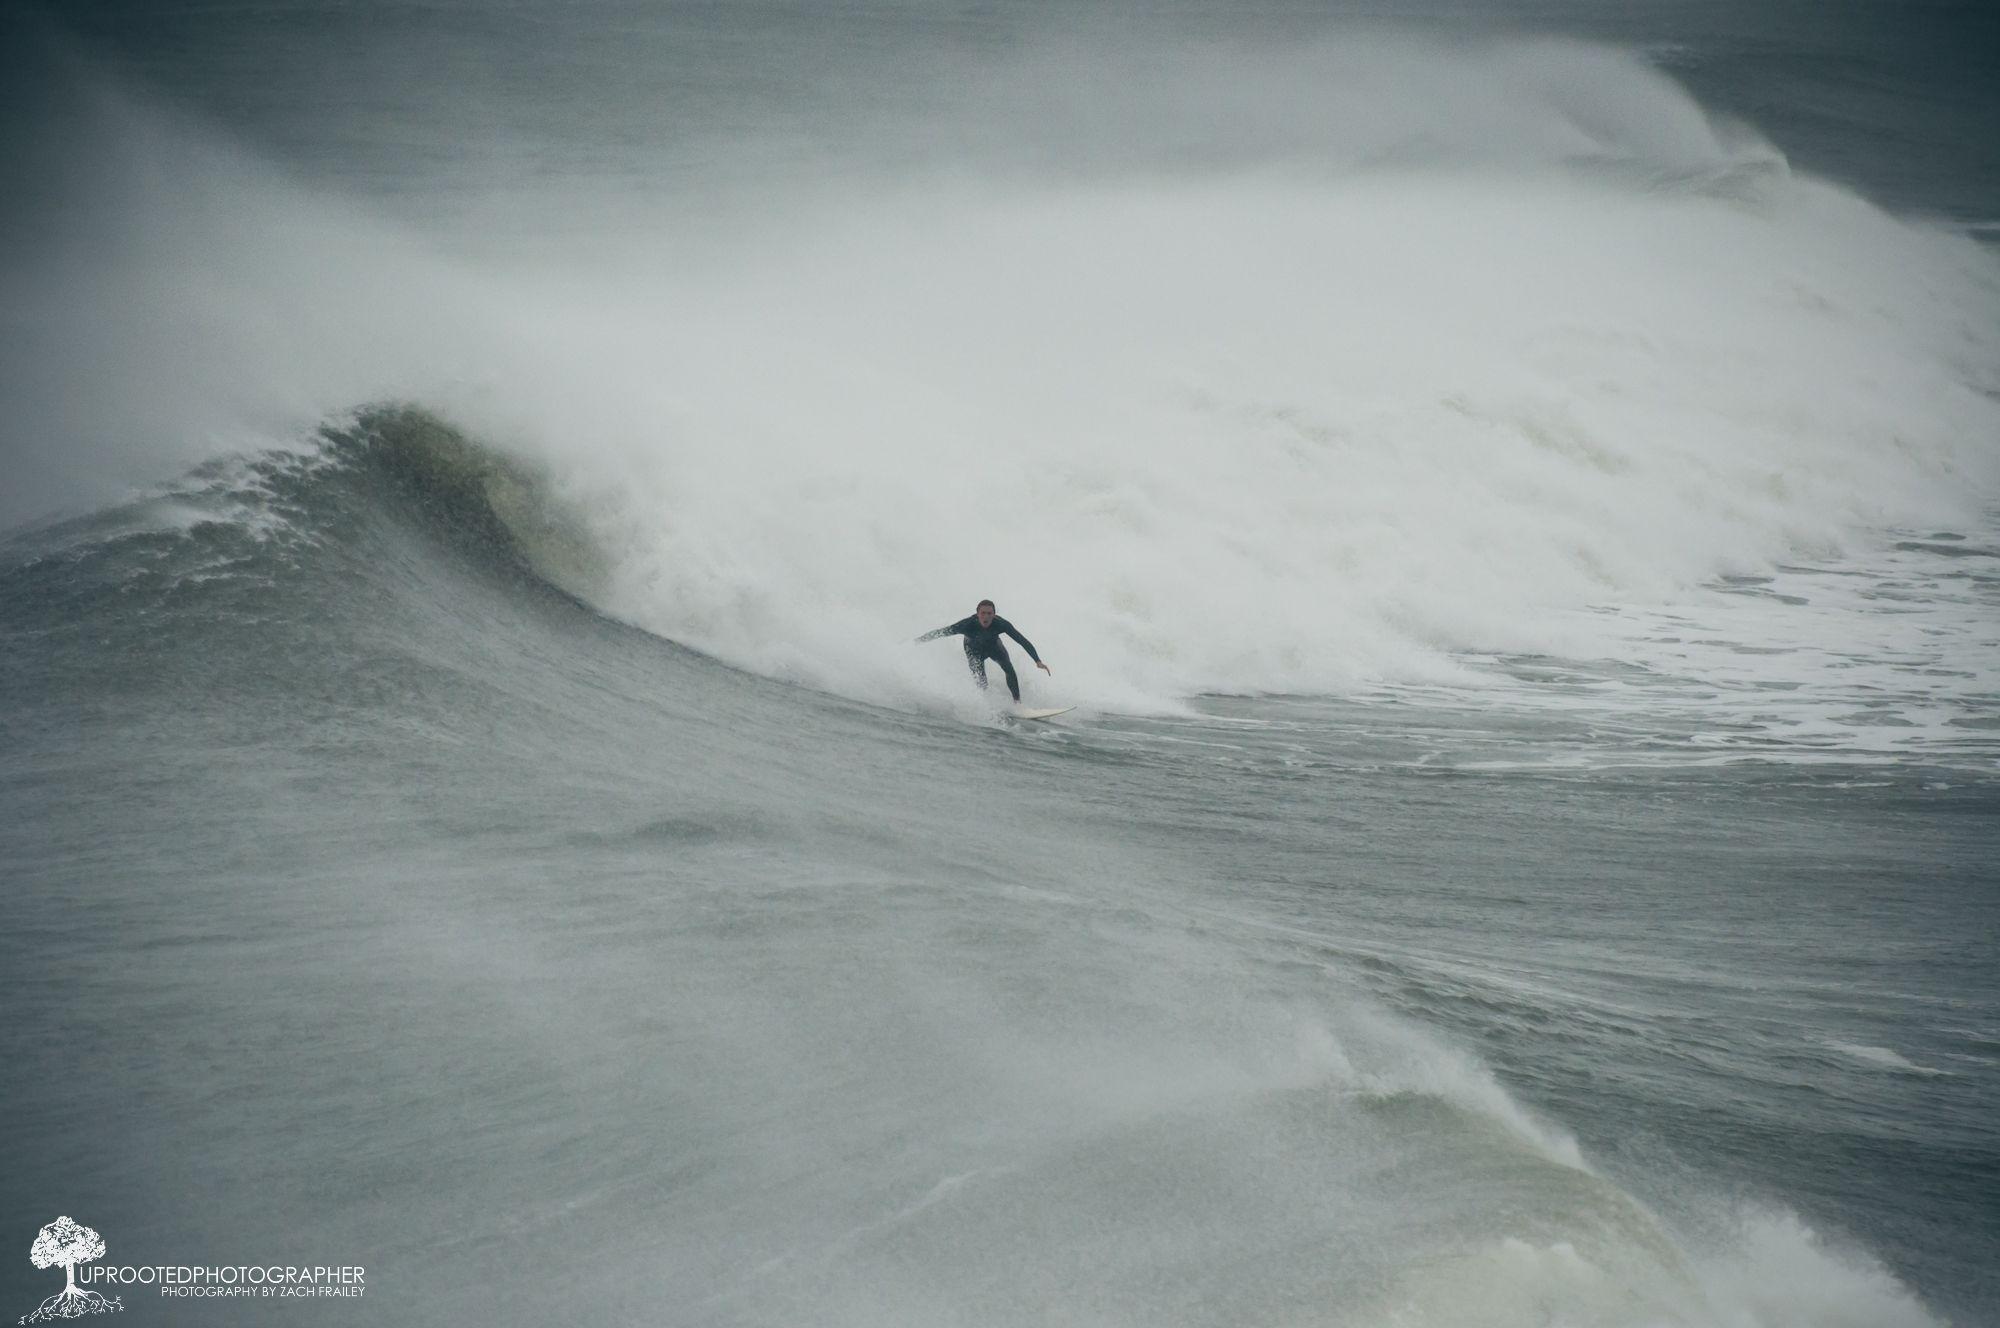 Saturday Video: Hurricane Season Surfing Thrills